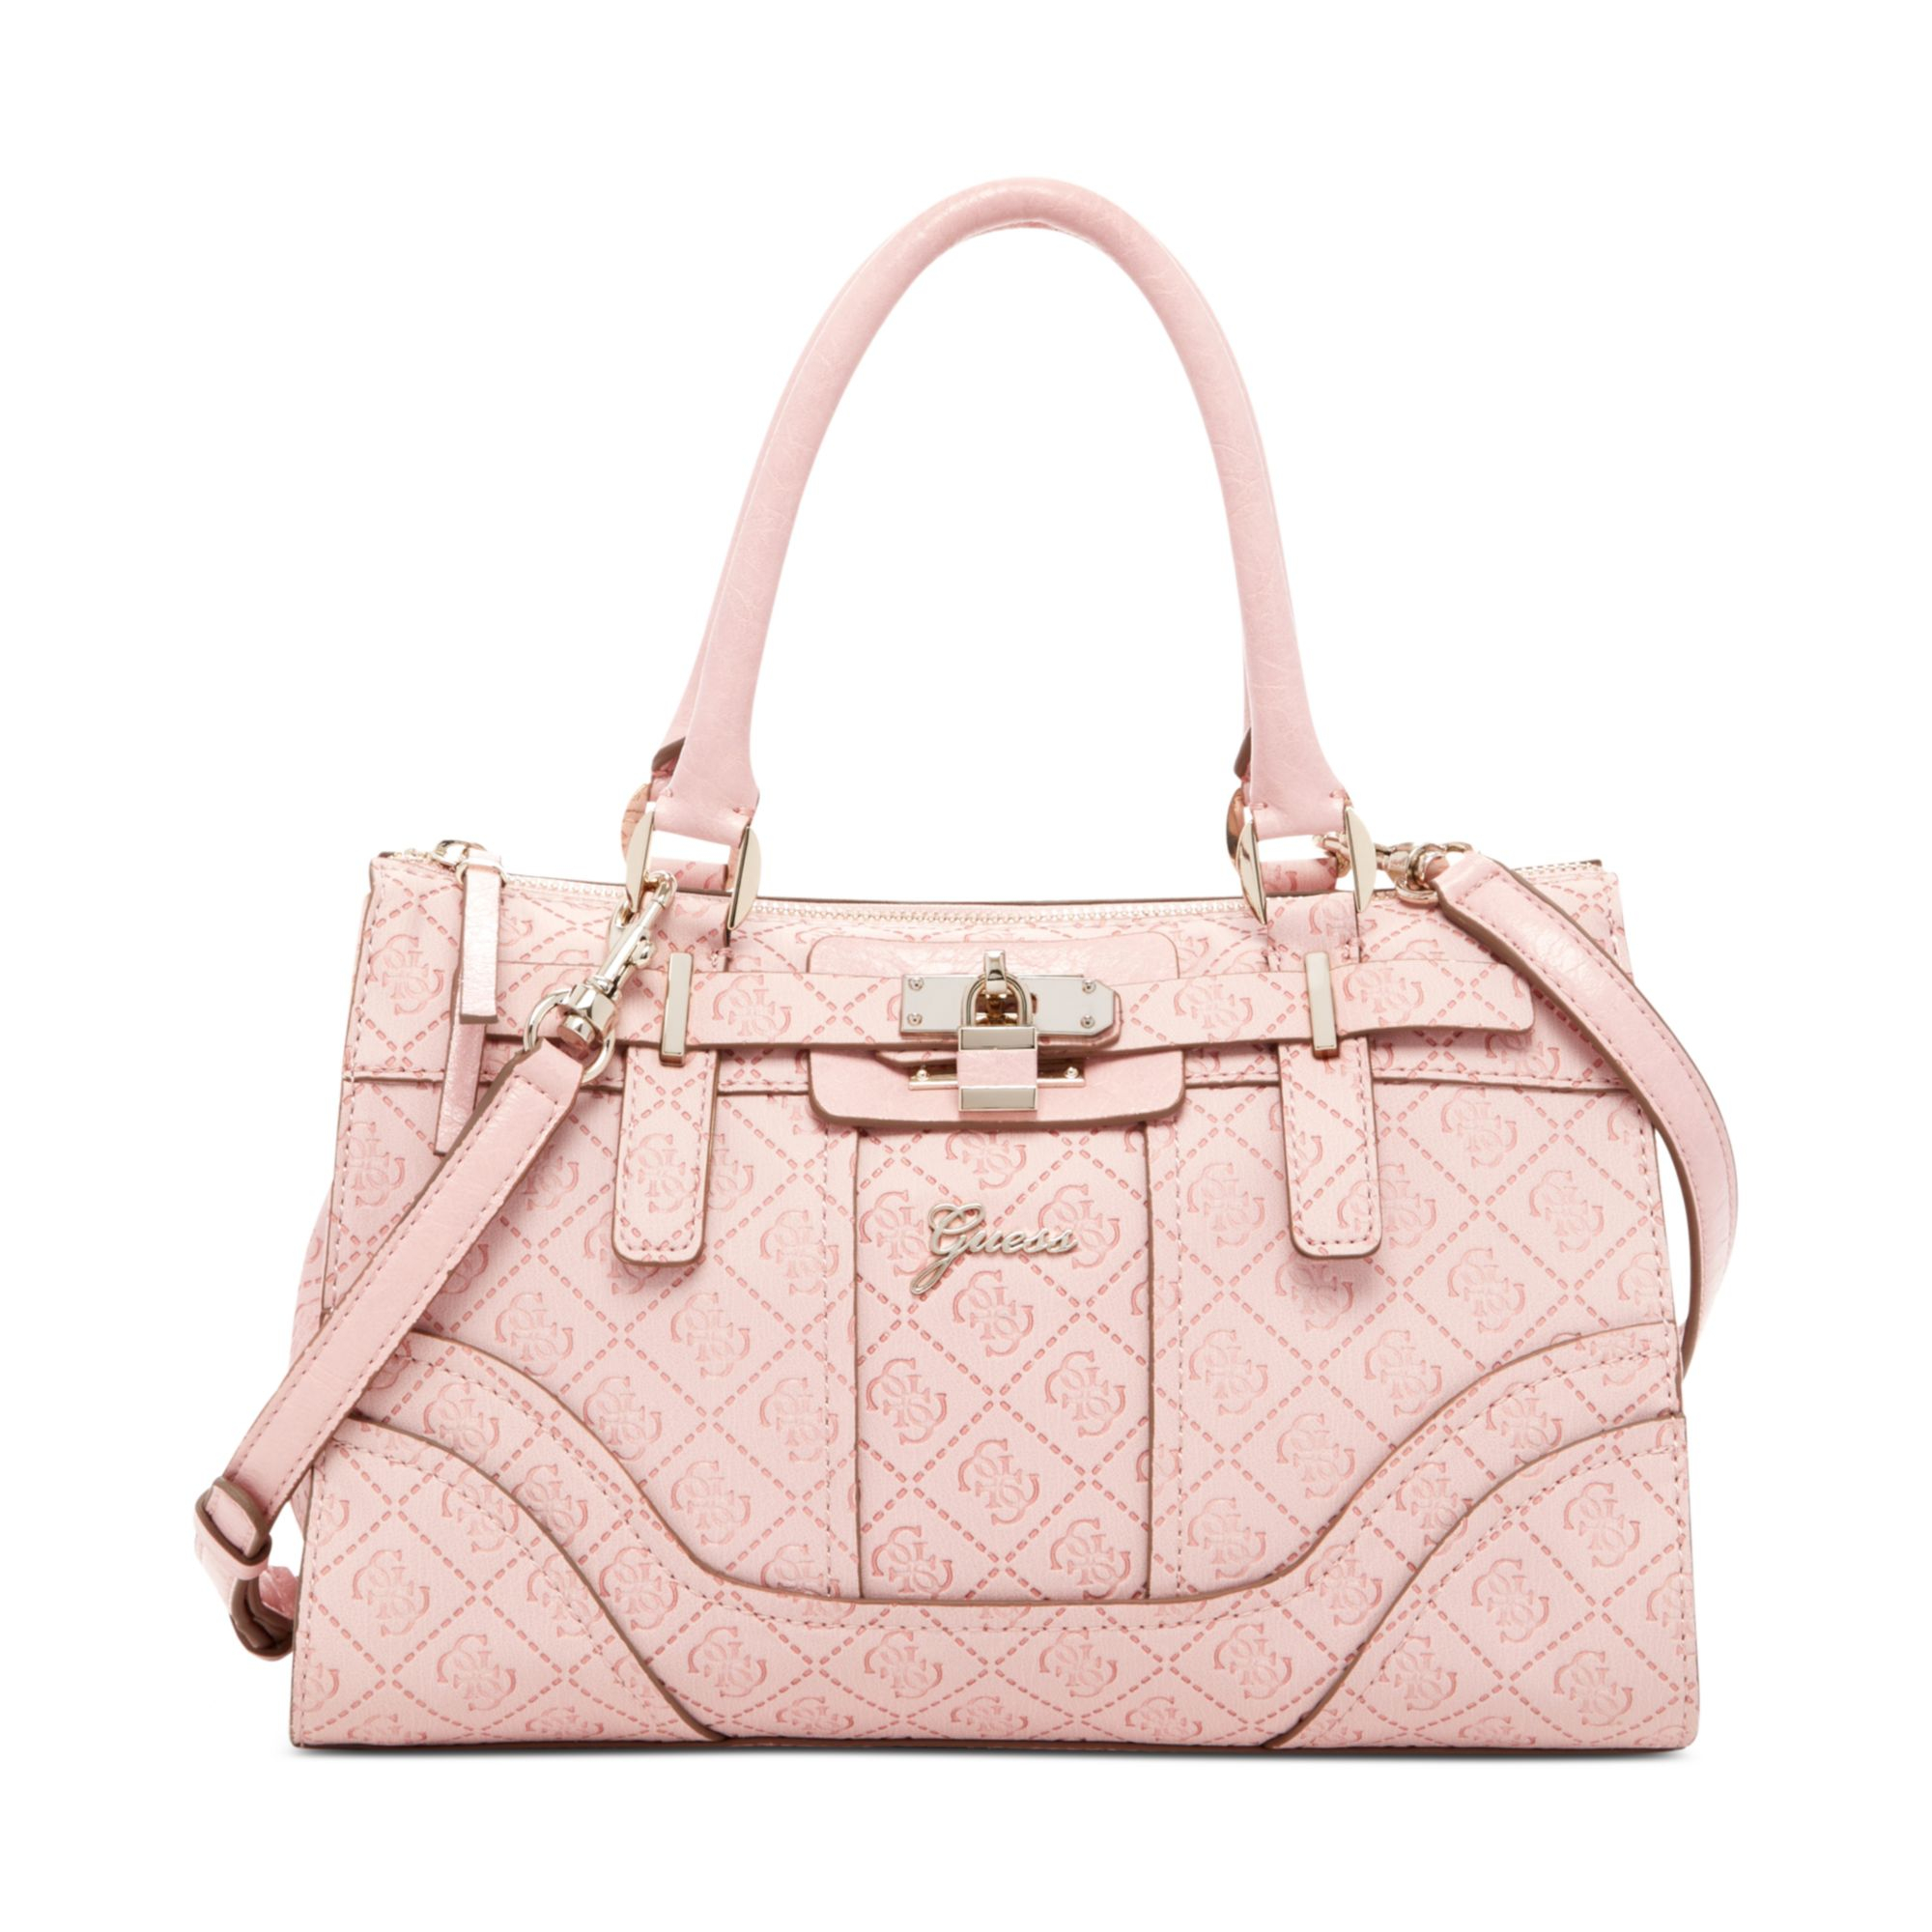 Pink Guess Purses Handbags Best Purse Image Ccdbb